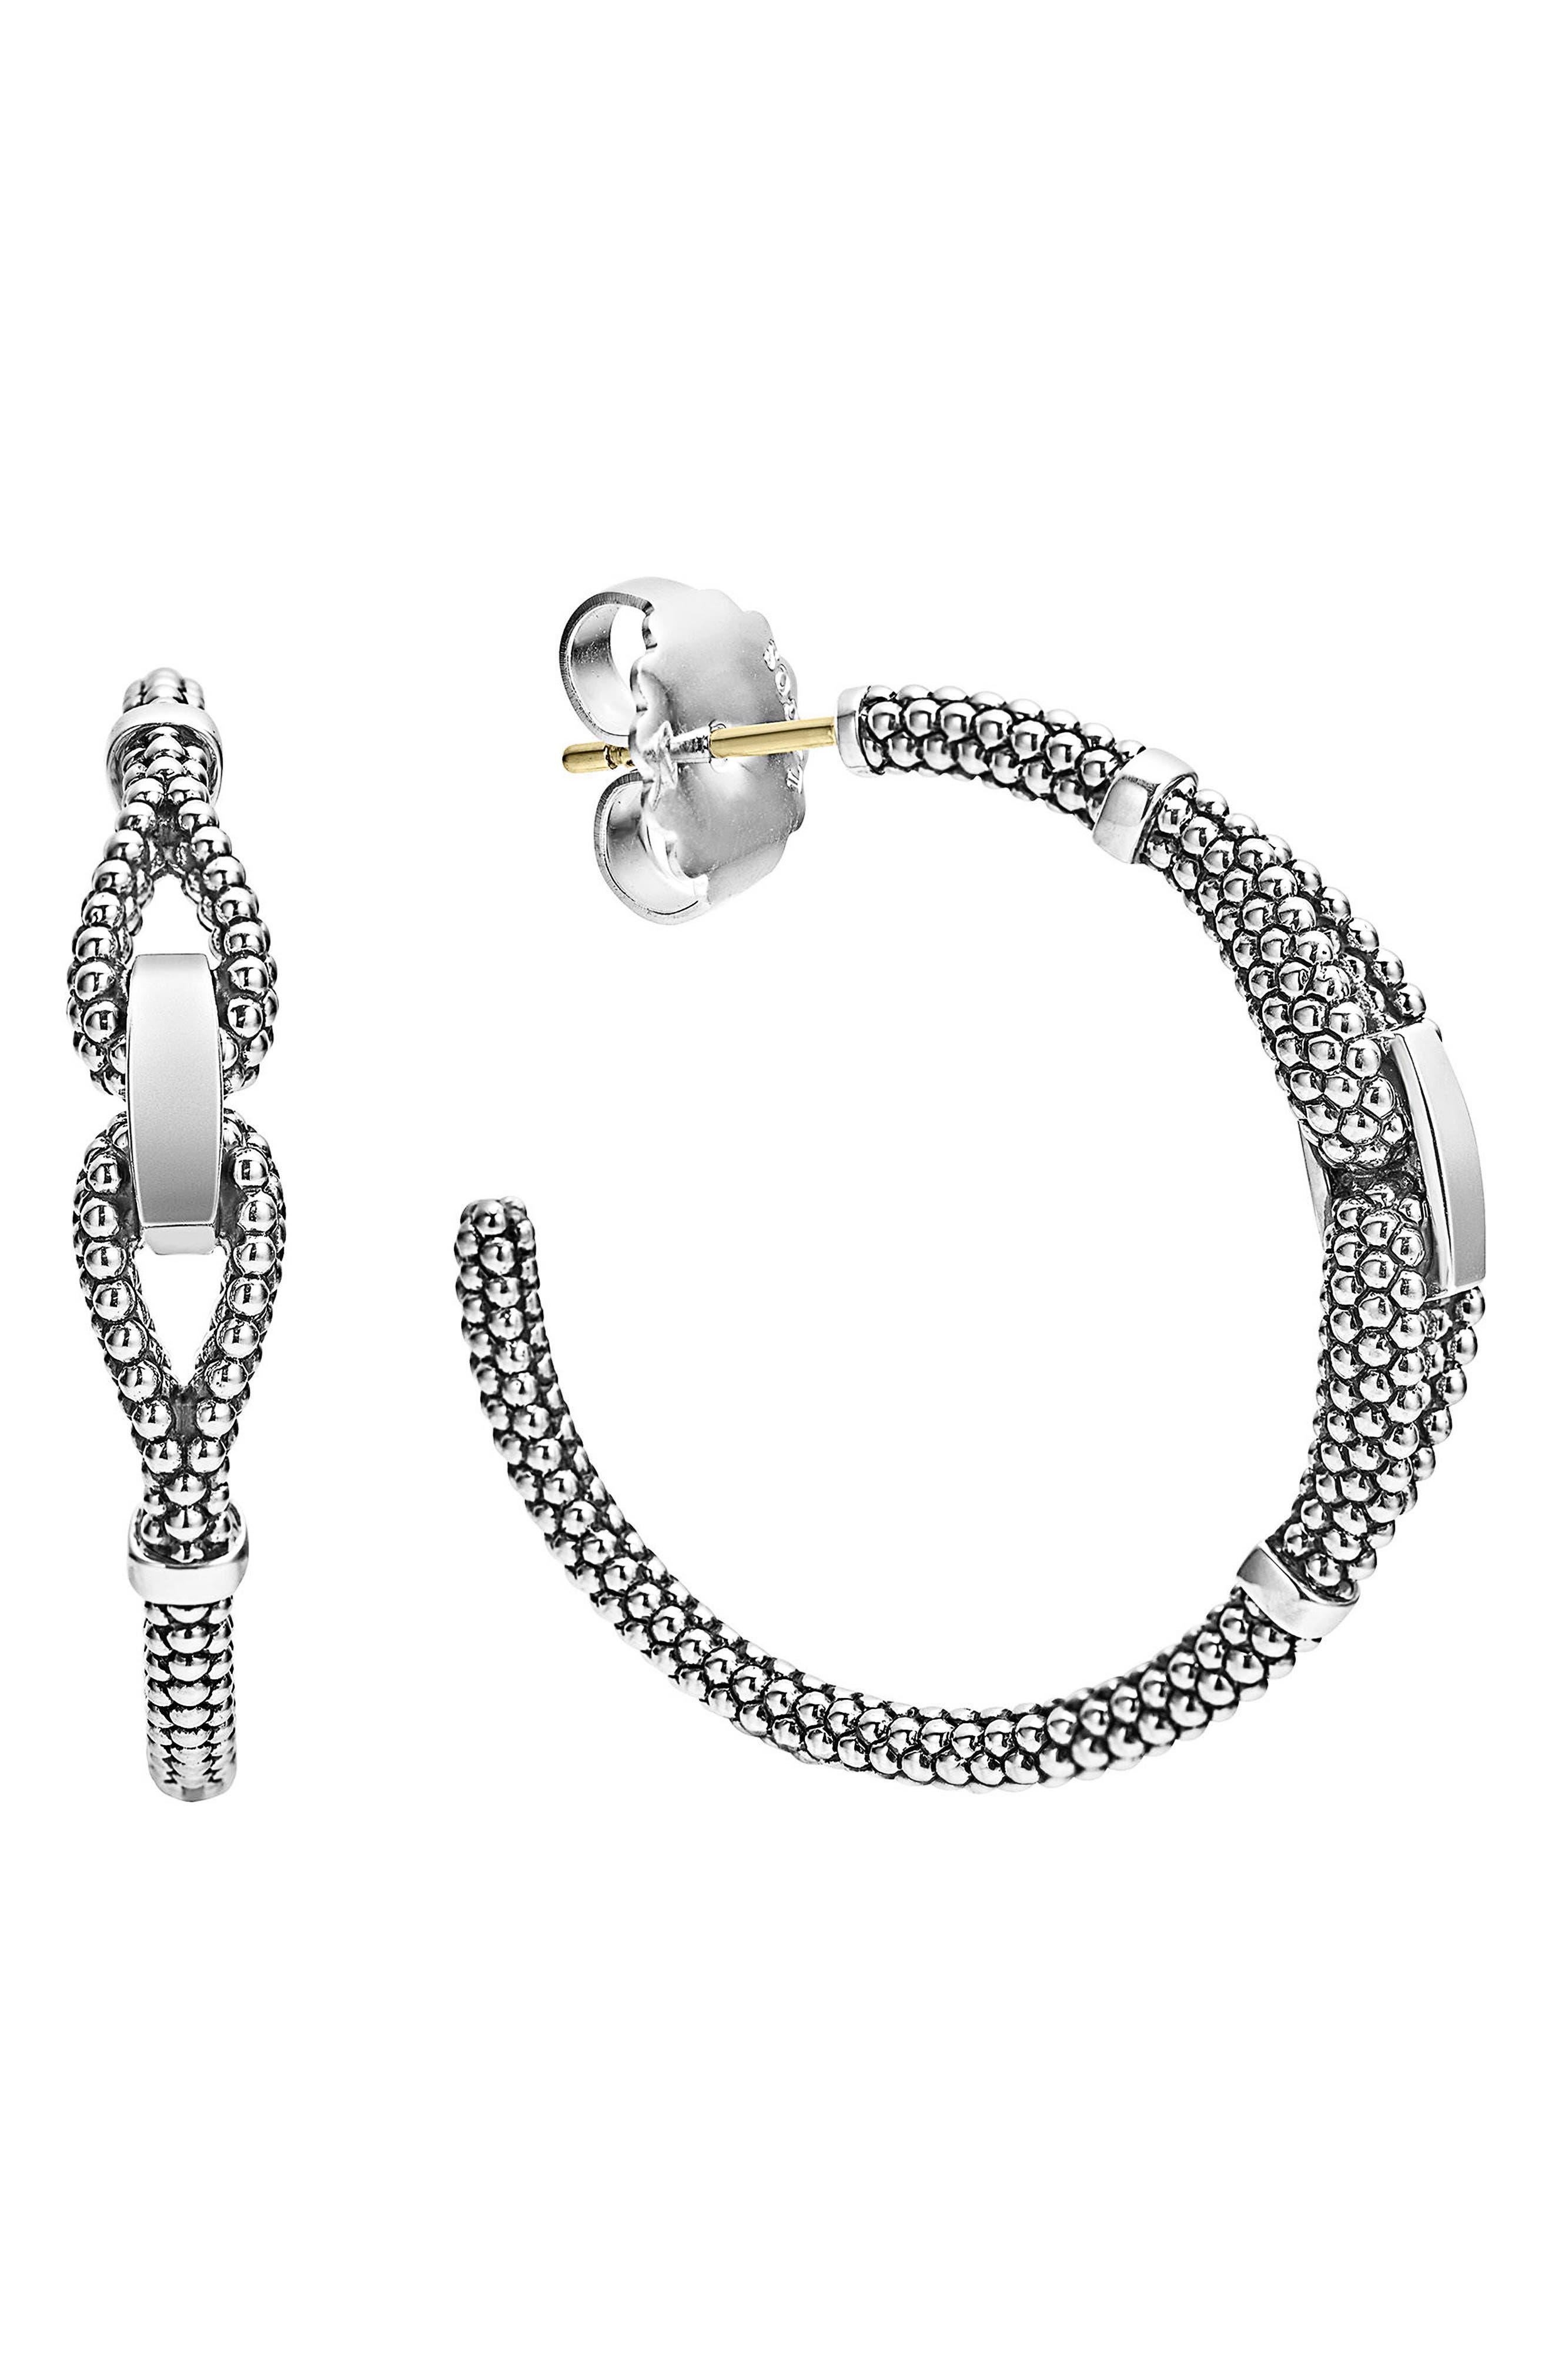 Derby Caviar Hoop Earrings,                             Main thumbnail 1, color,                             040